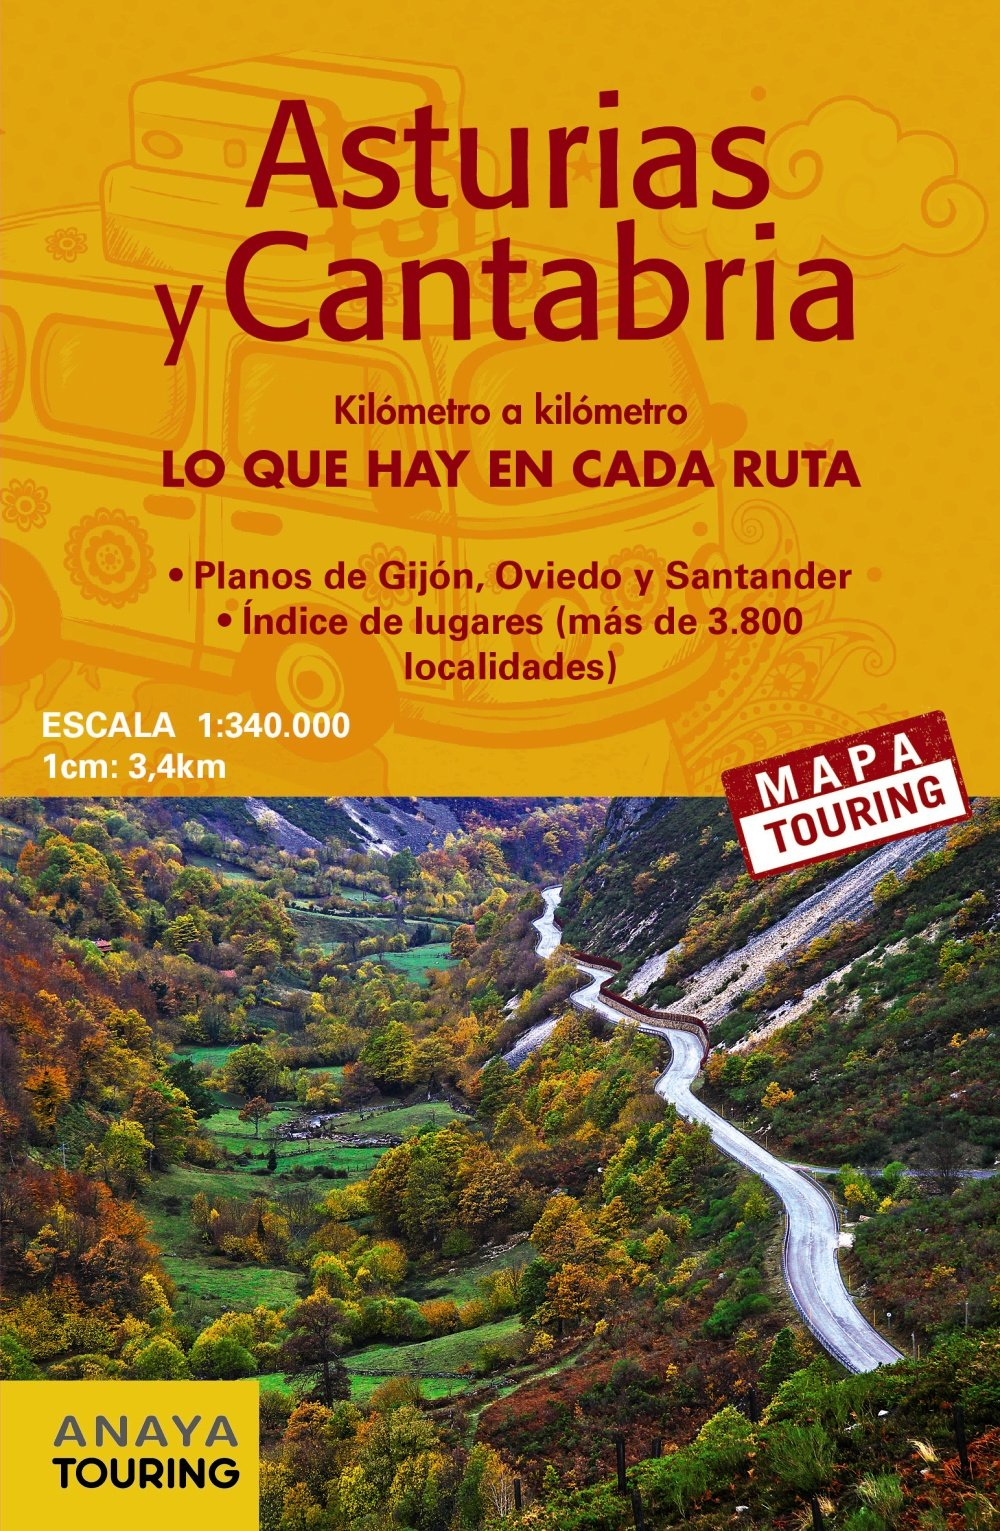 Mapa de carreteras Asturias y Cantabria desplegable , escala 1:340.000 Mapa Touring: Amazon.es: Anaya Touring: Libros